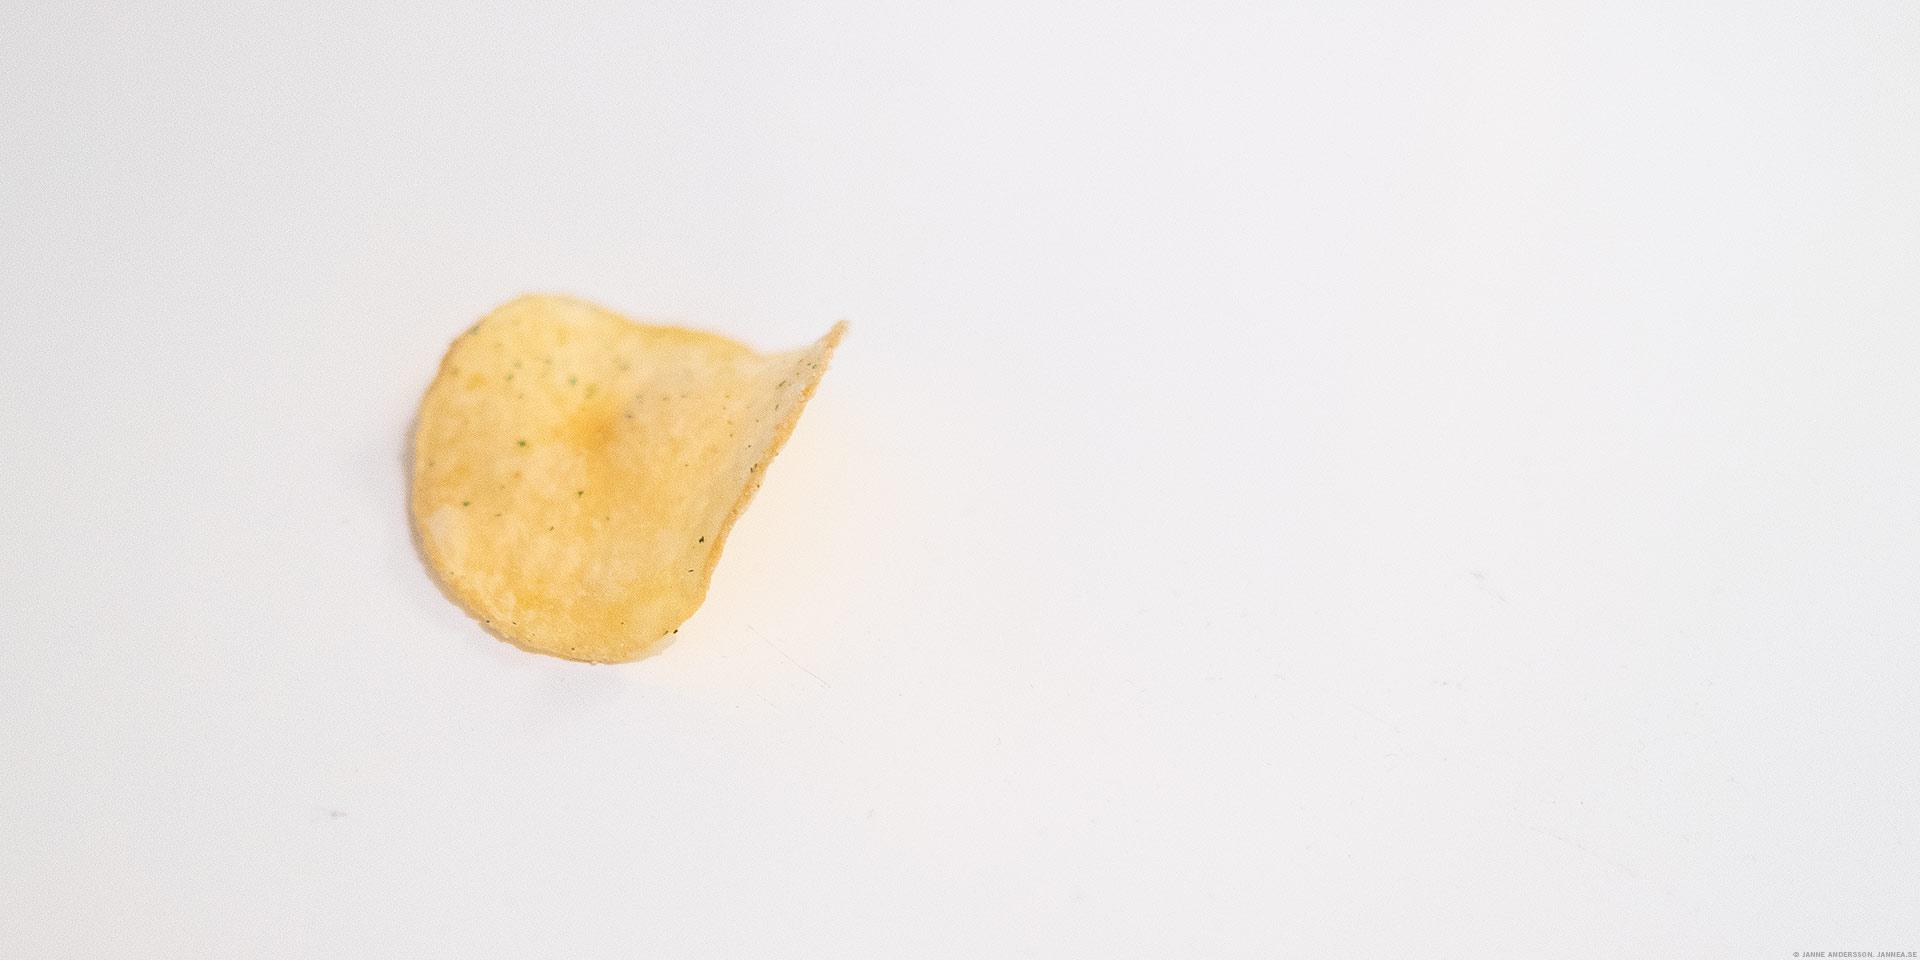 En fredagskväll och ett litet chips | © Janne A